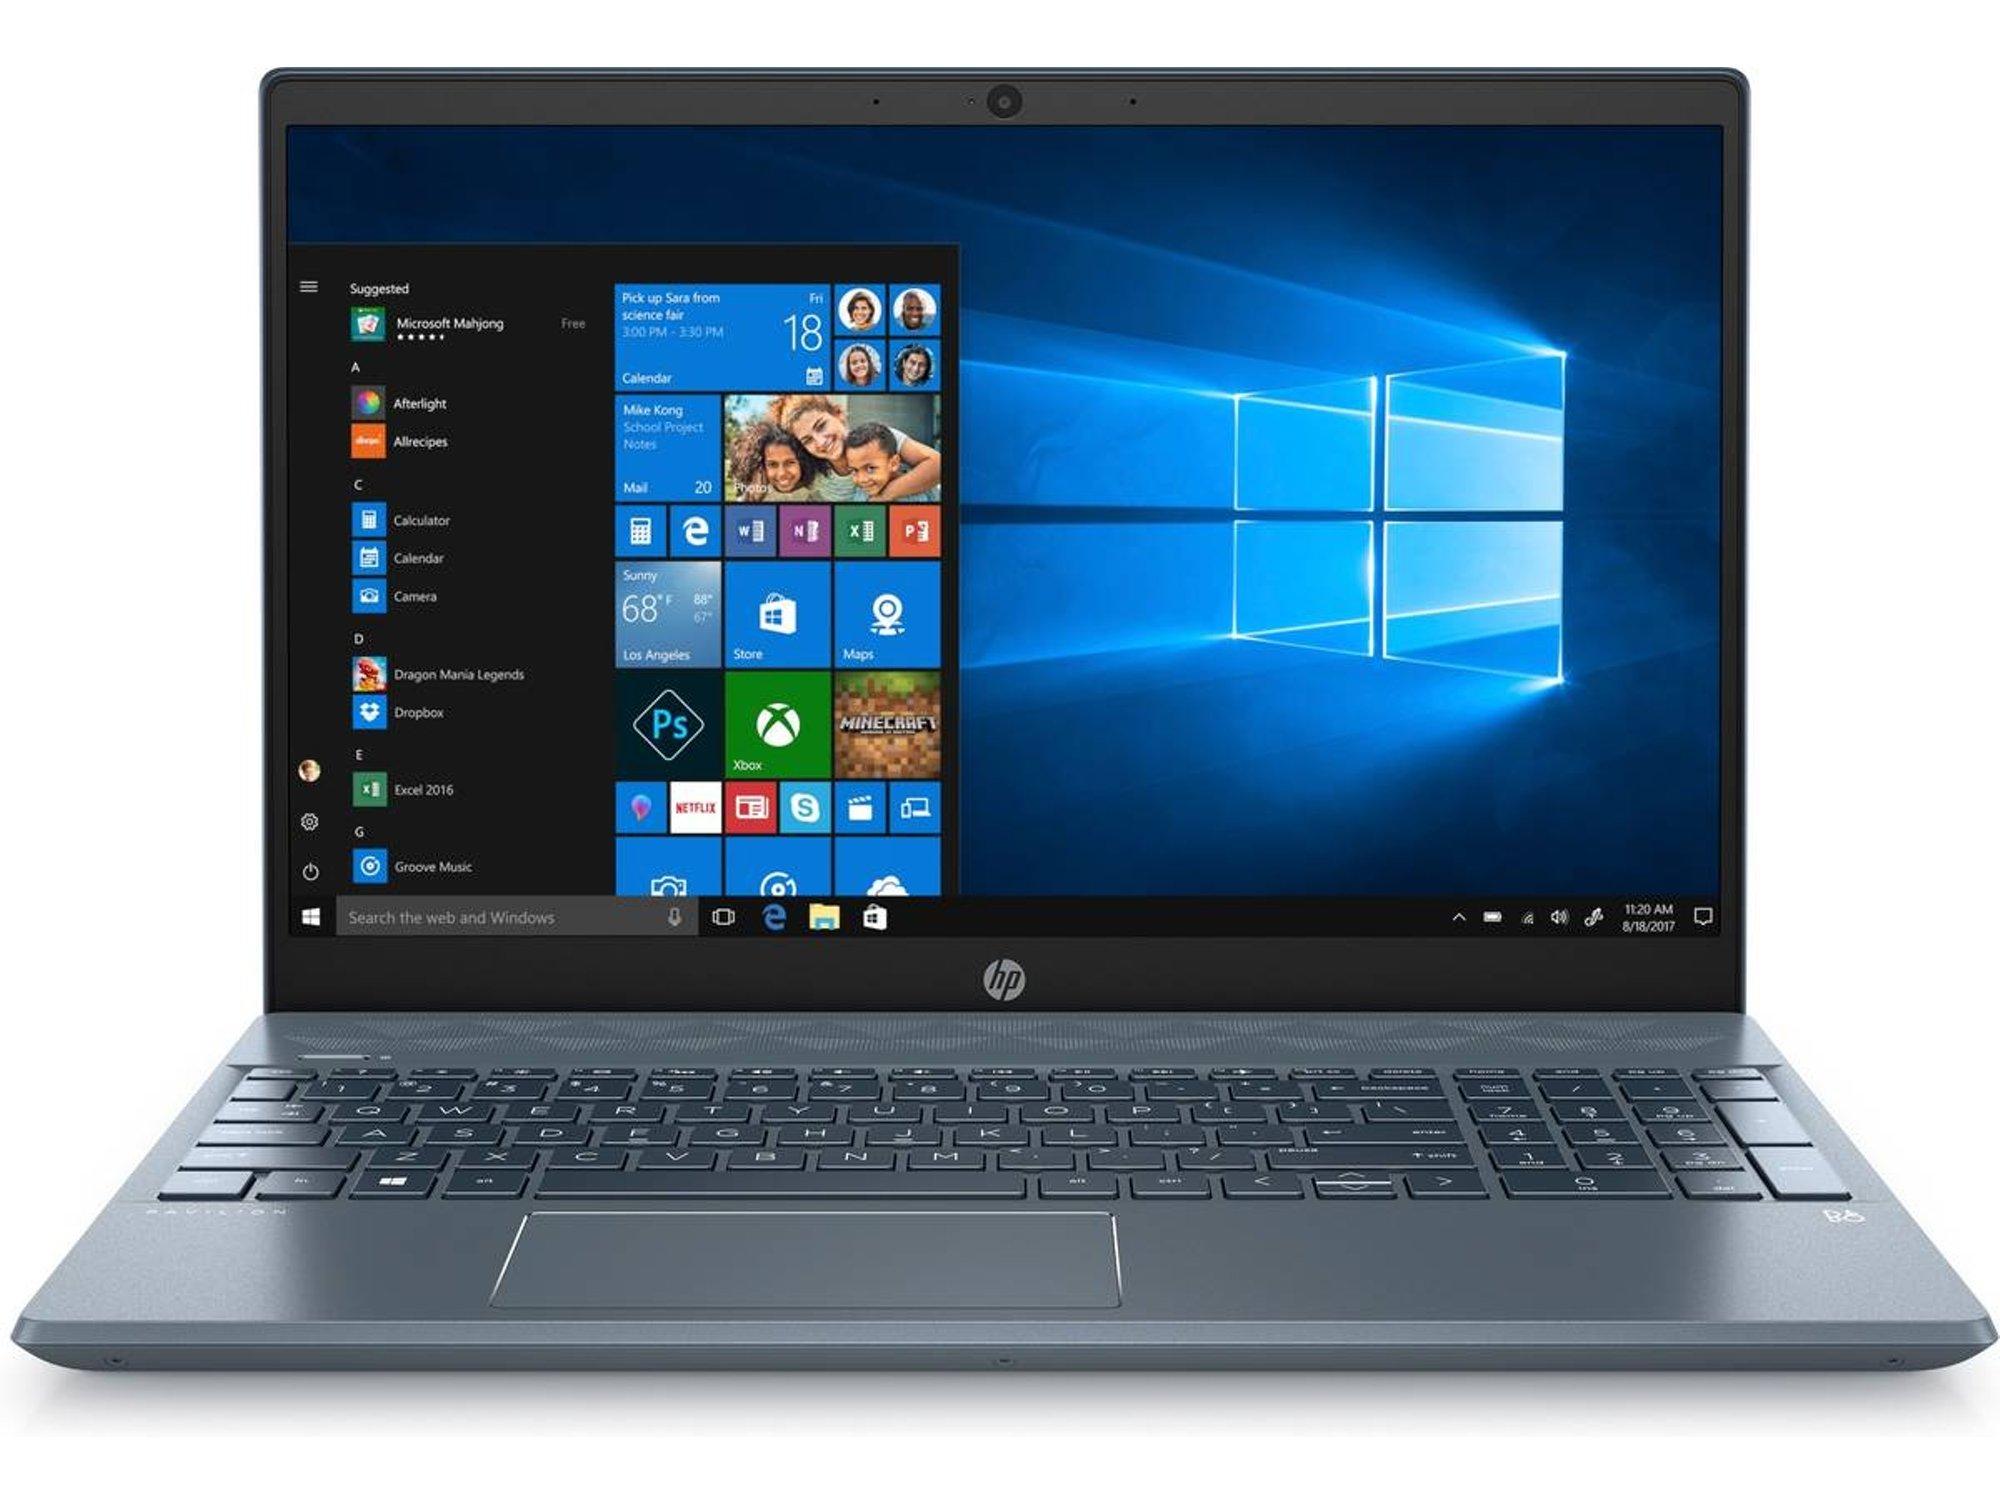 HP Pavilion 15-CS3009NS - 8AQ42EA (15.6'' - Intel Core i5-1035G1 - RAM: 16 GB - 512 GB SSD - NVIDIA GeForce MX130)